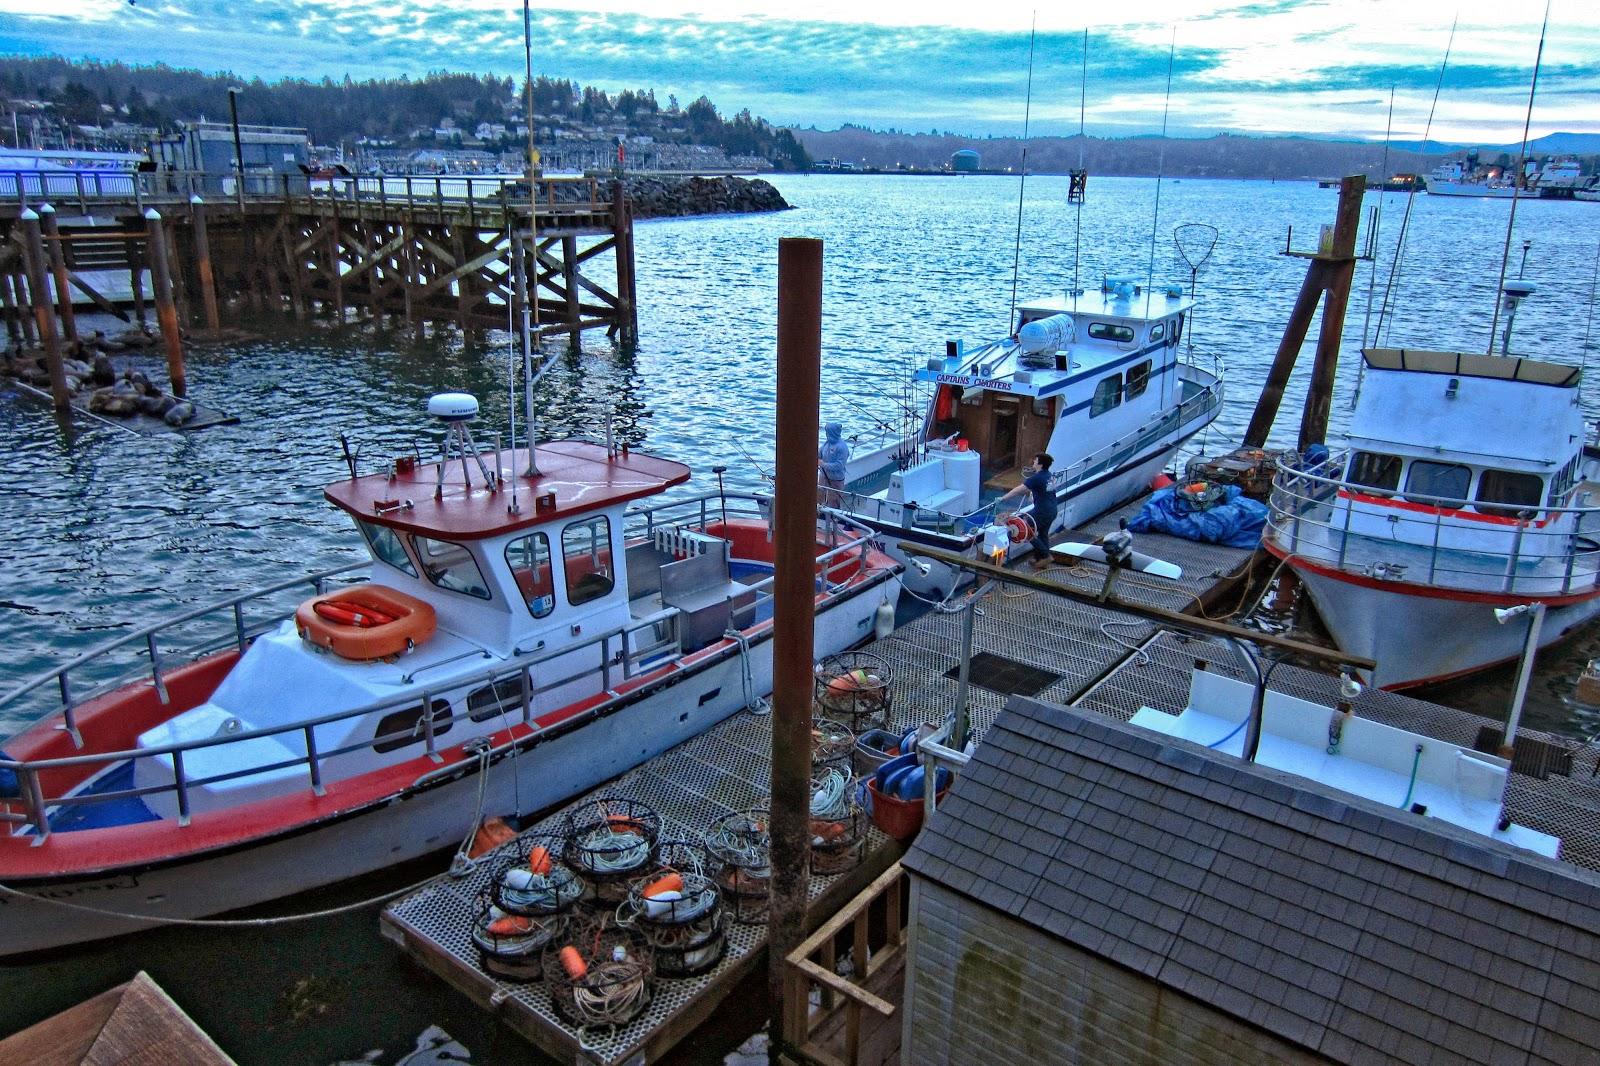 Thom zehrfeld photography captain 39 s reel charters for Newport oregon fishing charters